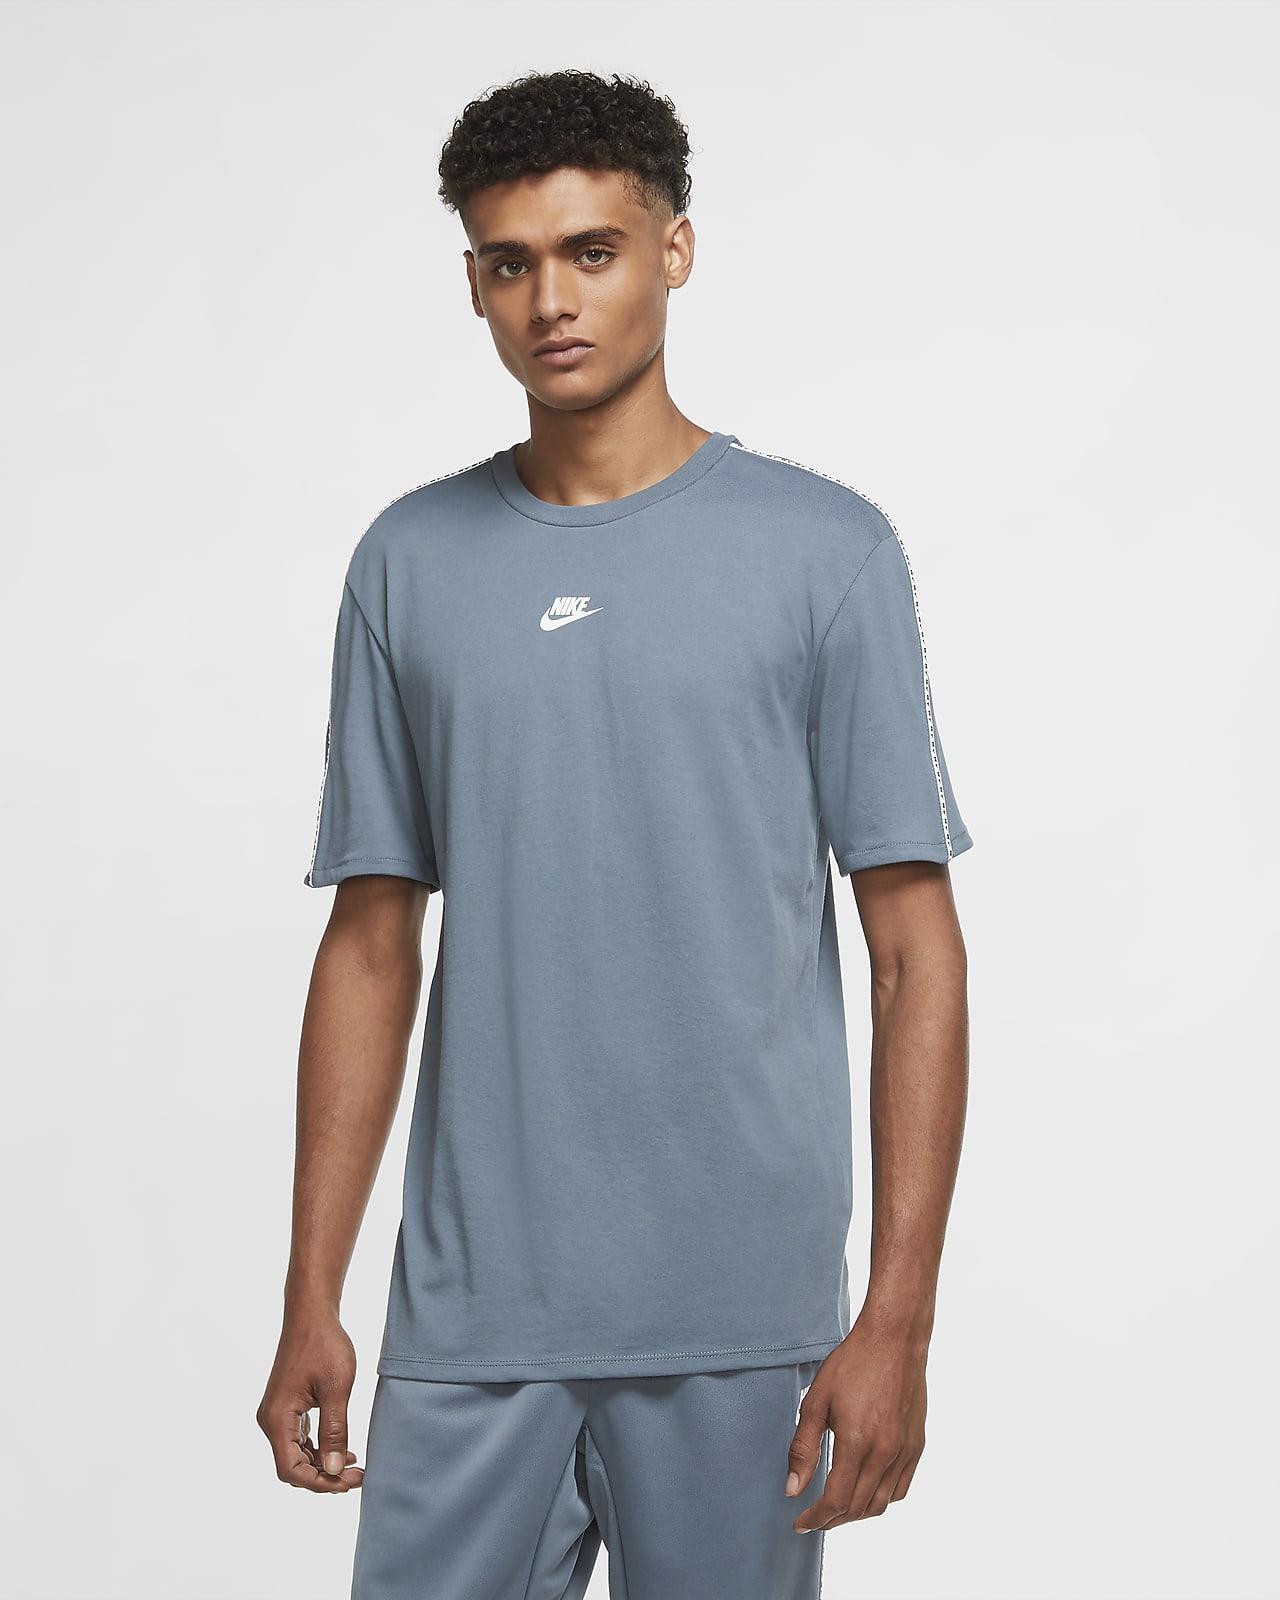 Nike Sportswear Herren-Kurzarmoberteil